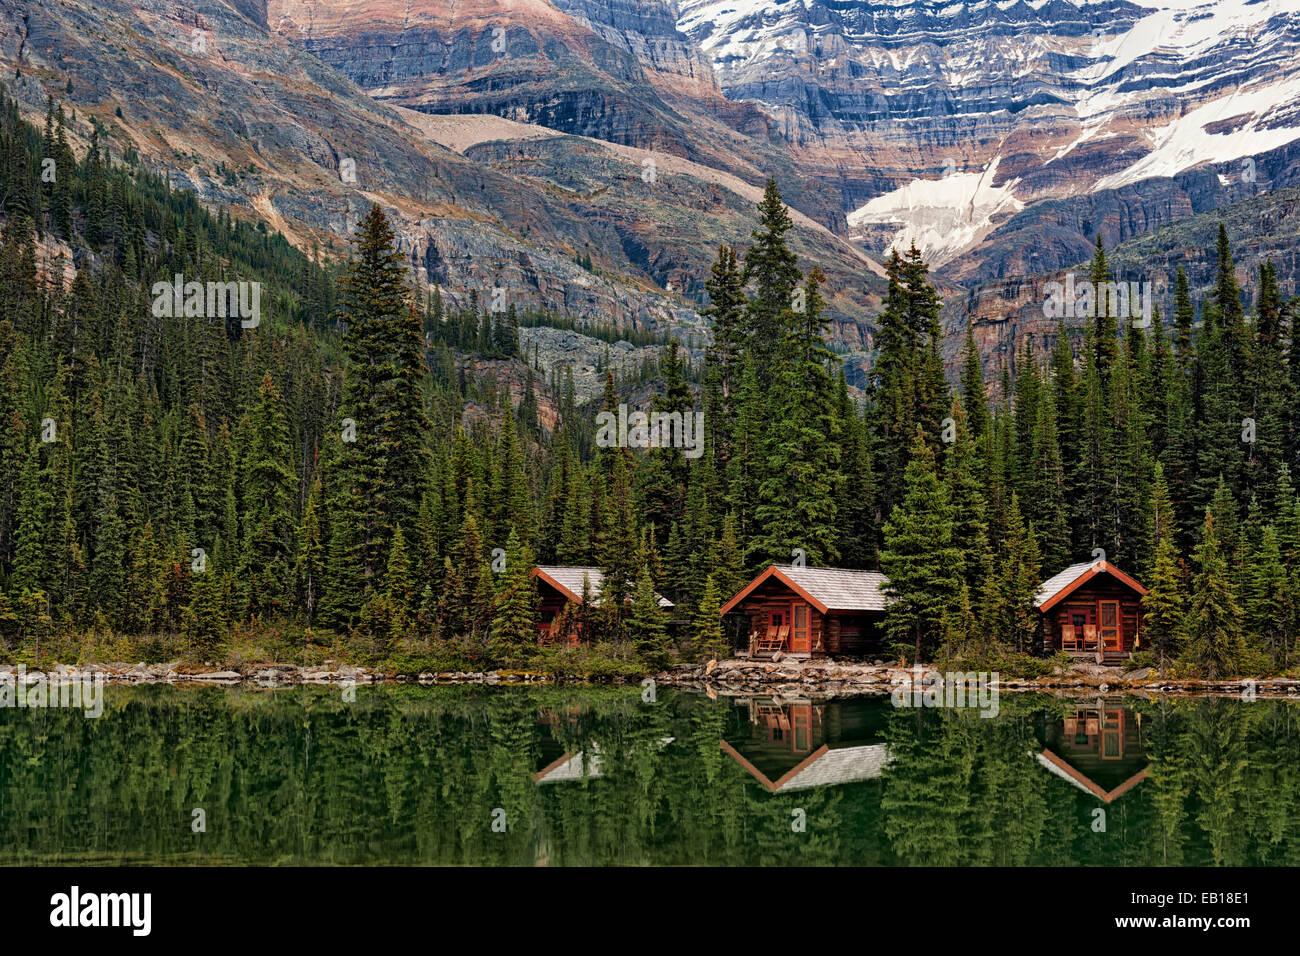 Umkleidekabinen am Lake O'Hara in British Columbia kanadischen Rockies und Yoho-Nationalpark. Stockbild